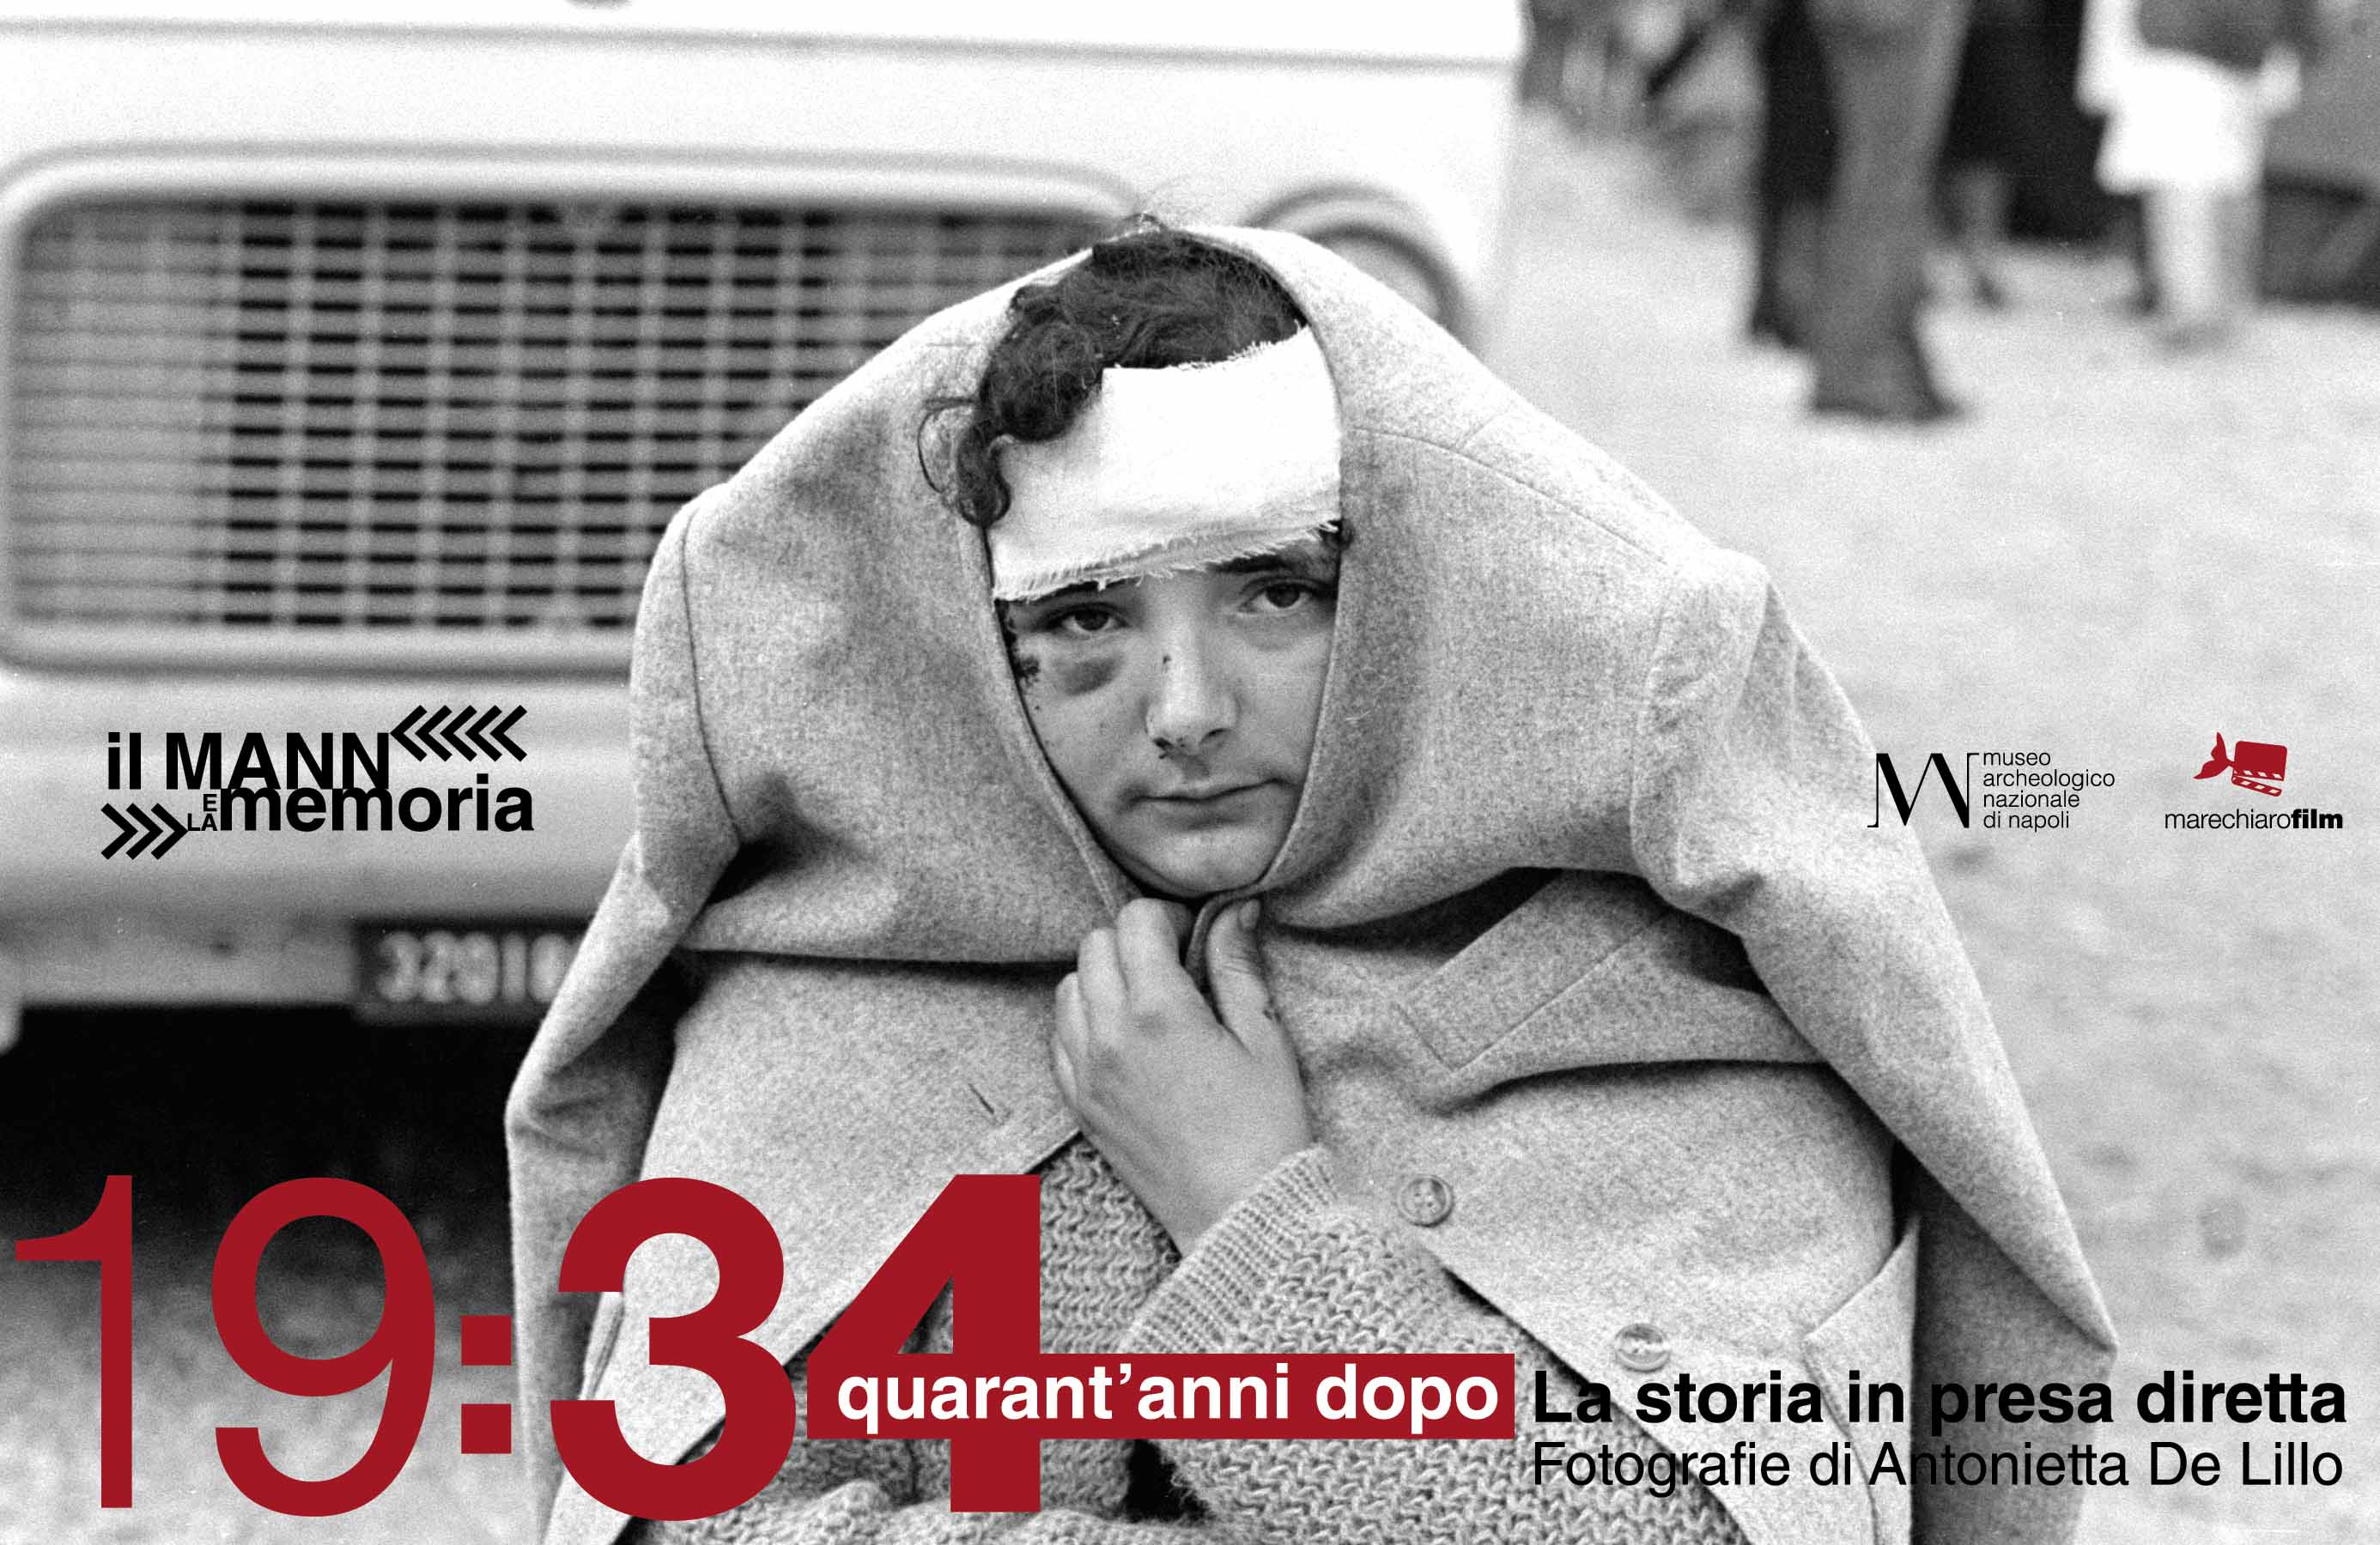 napoli_mann_terremoto_ mostra 19.34_locandina